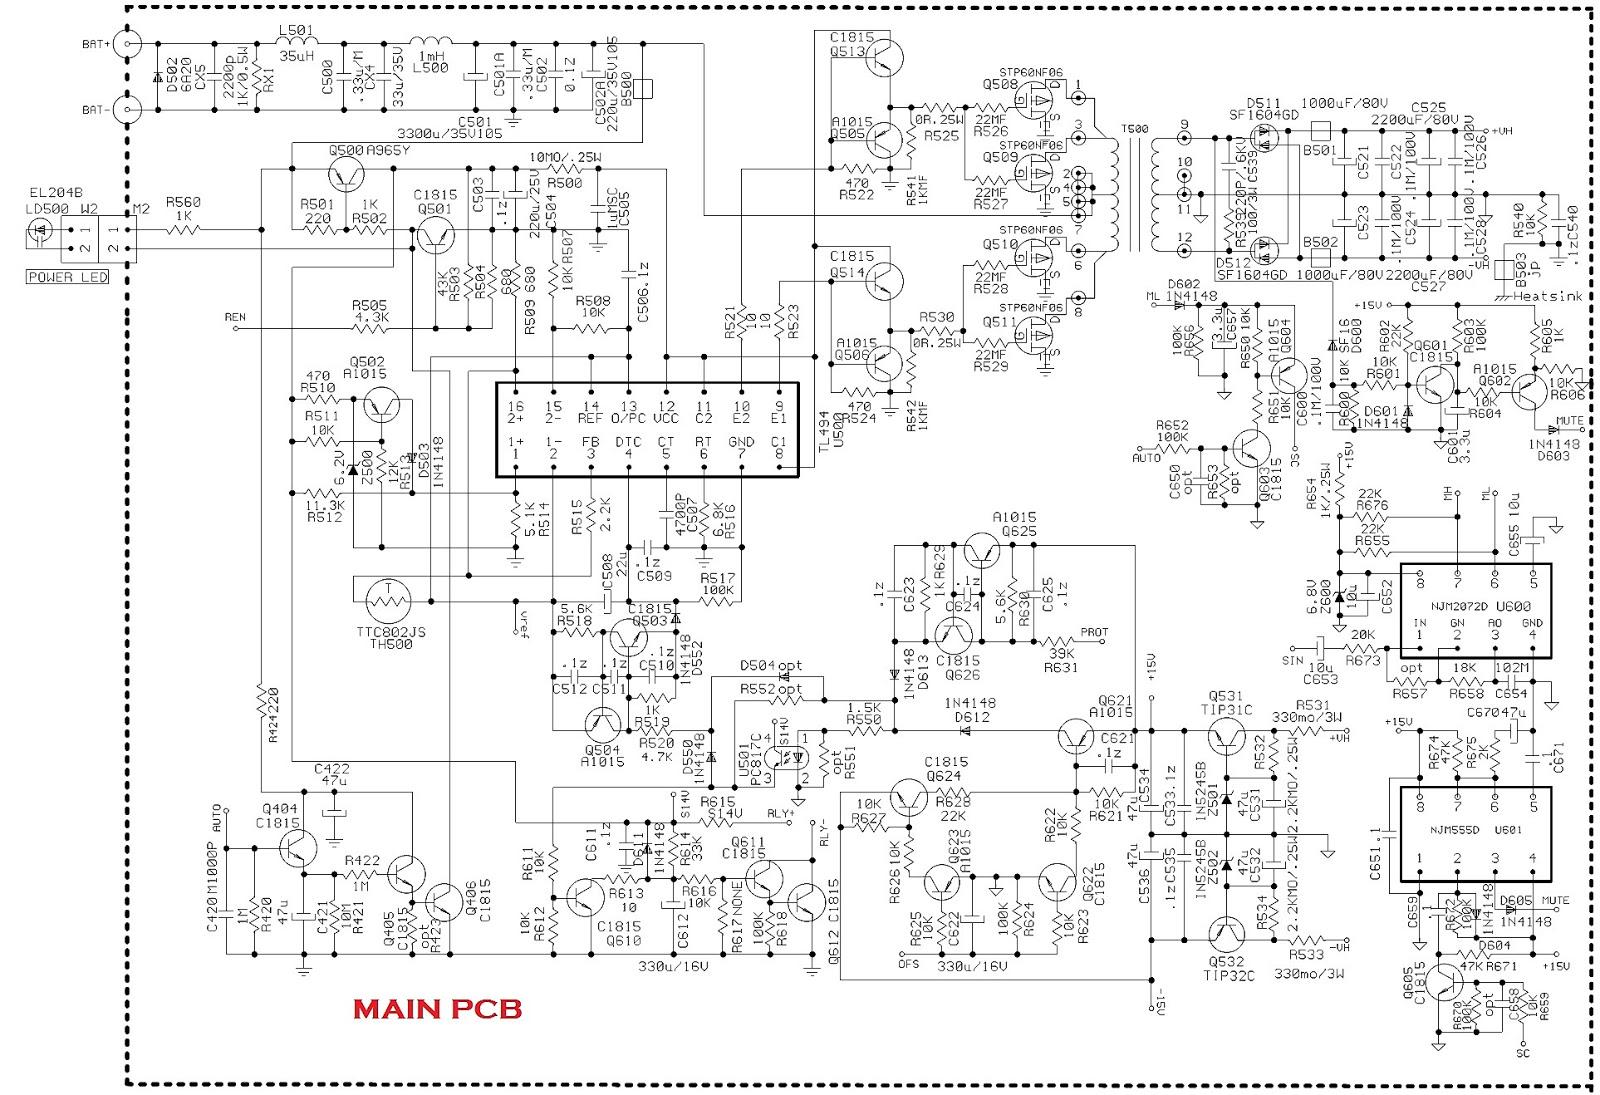 hight resolution of infiniti g35 radio wiring diagram free image about wiring diagram